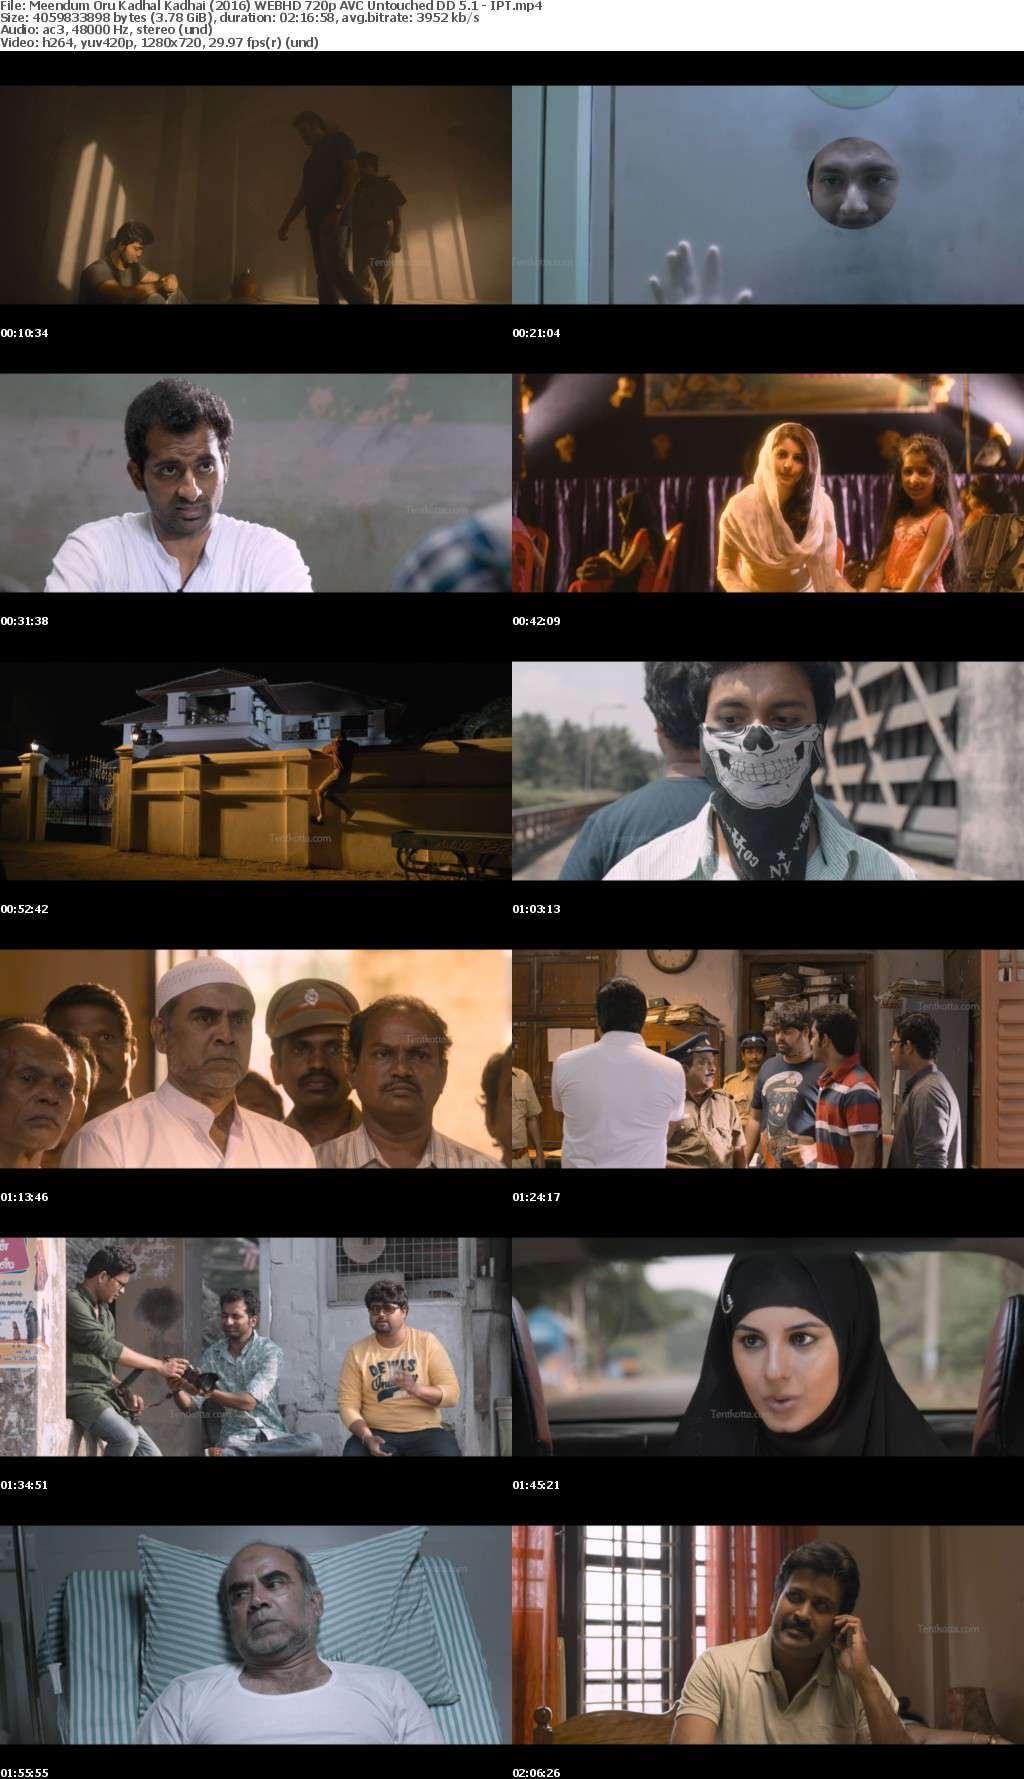 Meendum Oru Kadhal Kadhai (2016) WEBHD 720p AVC Untouched DD 5 1 -